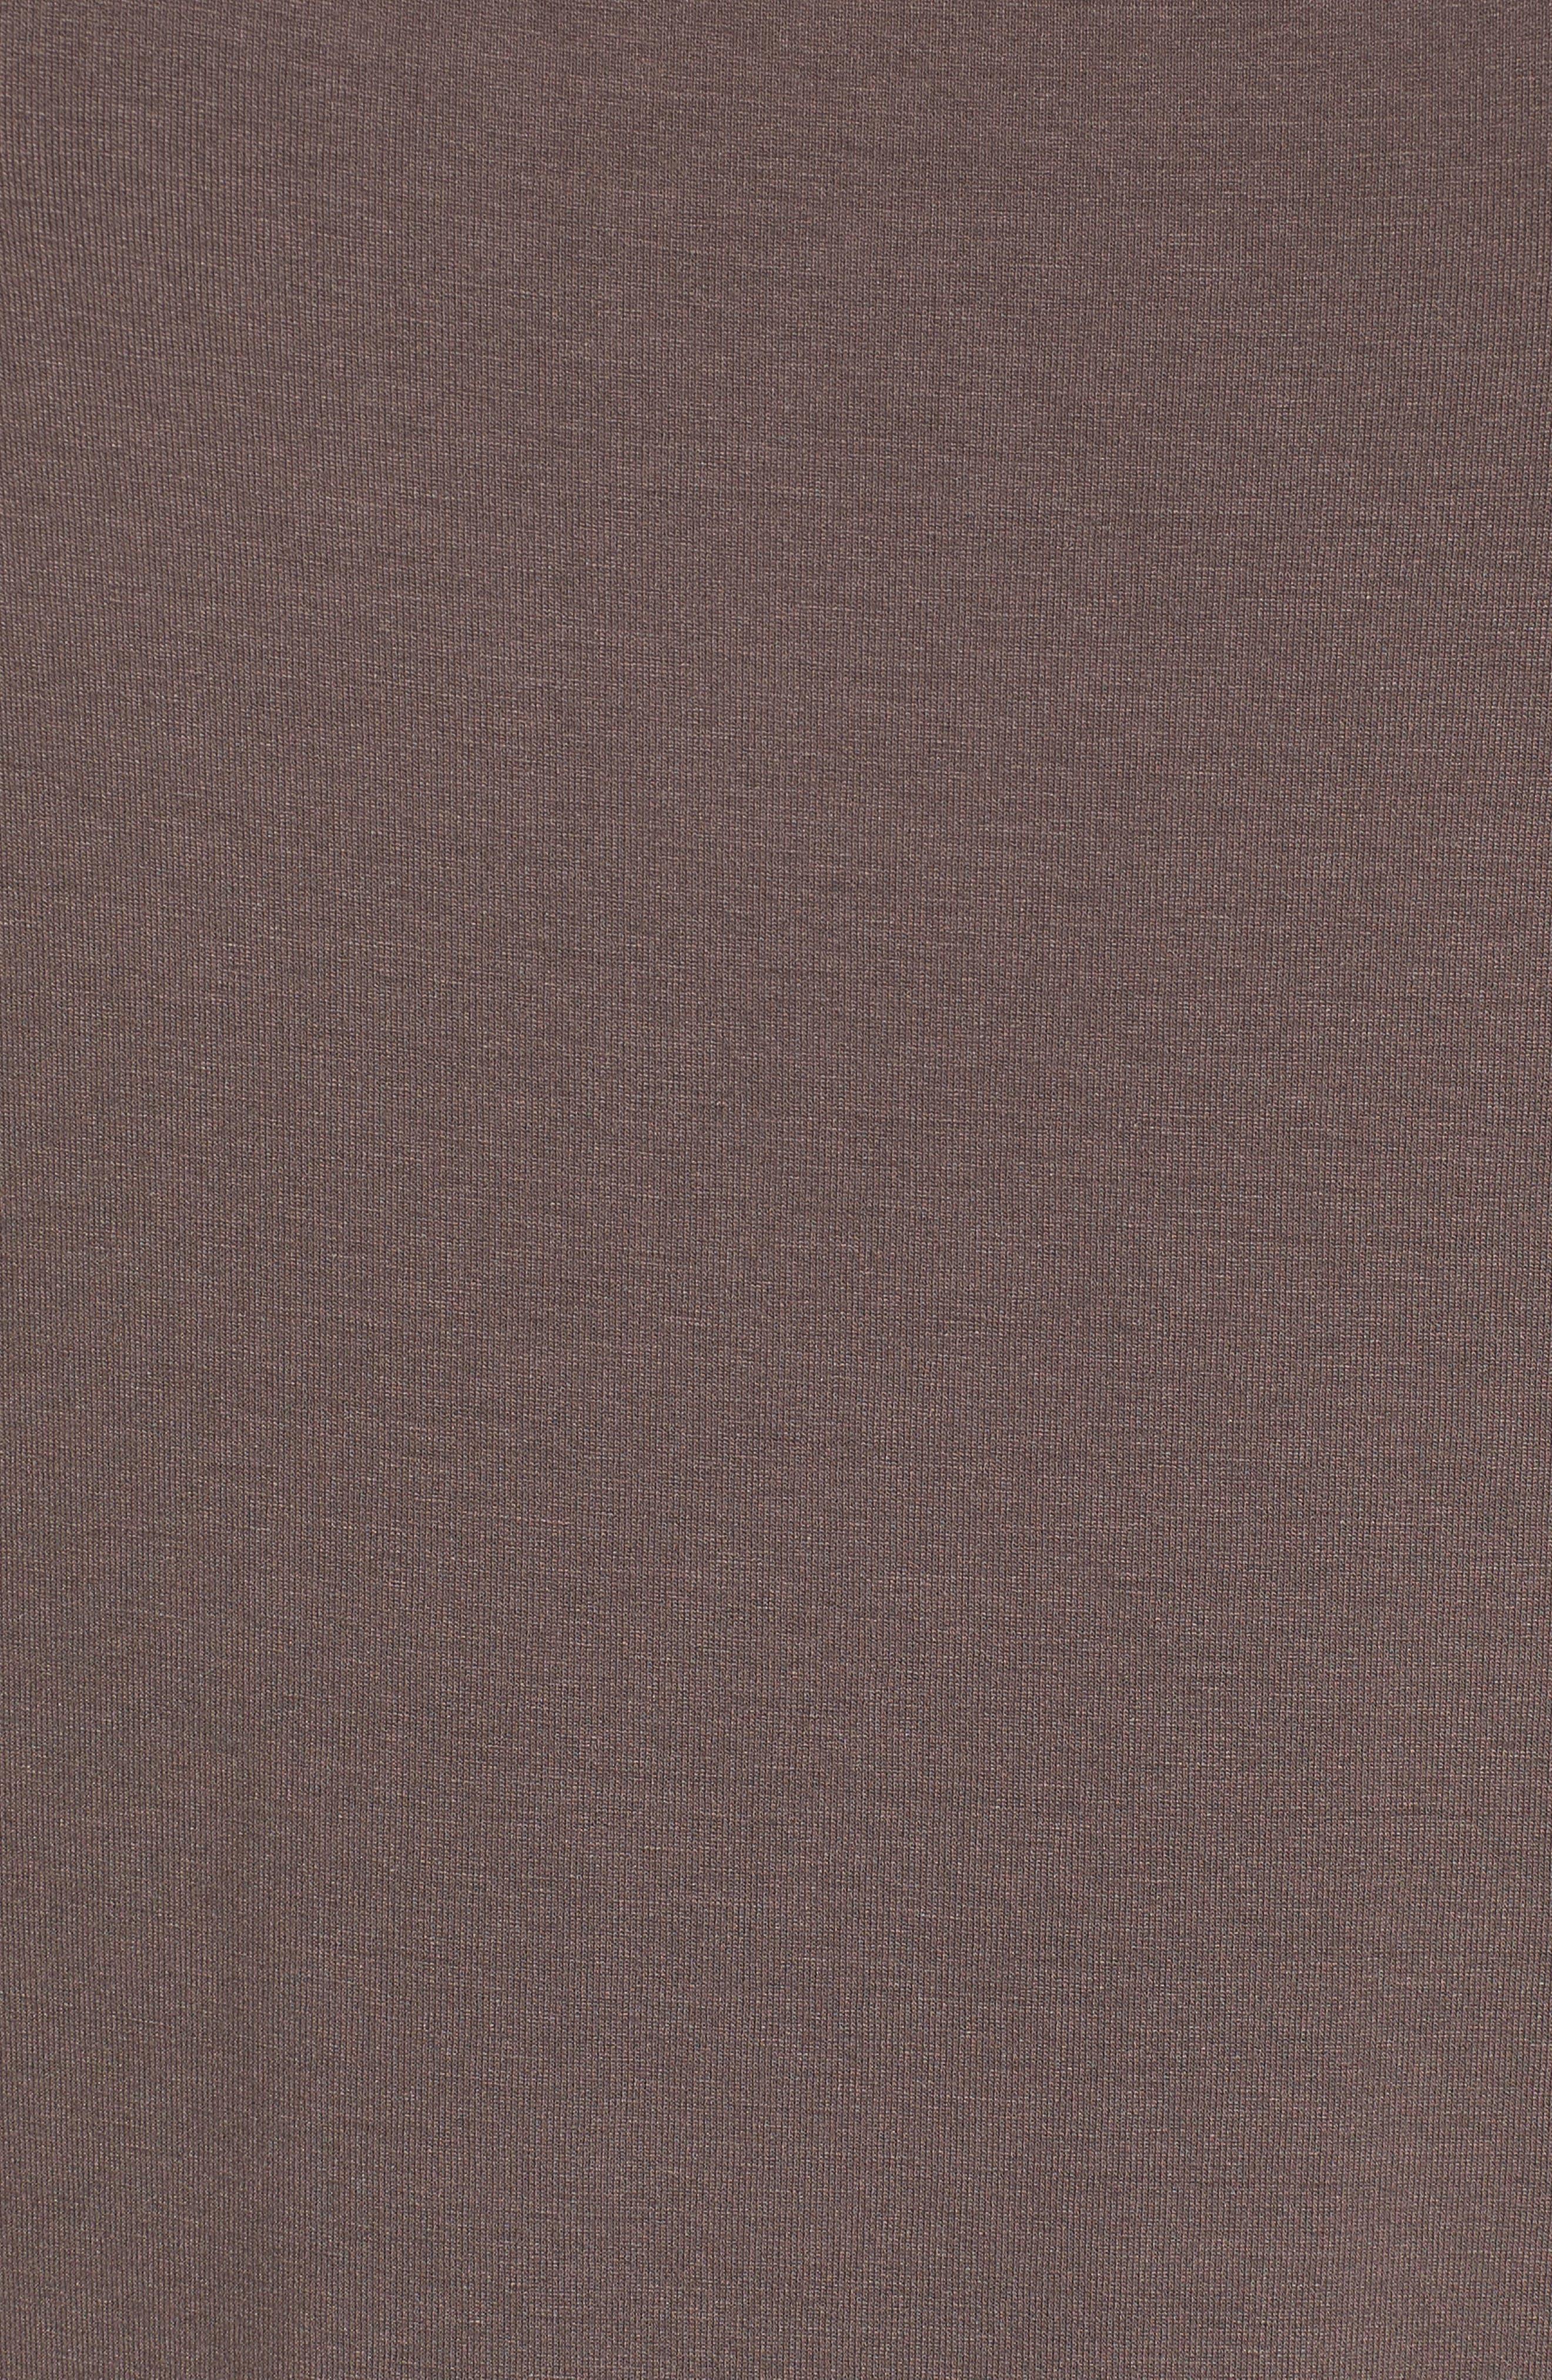 Scoop Neck Jersey Midi Dress,                             Alternate thumbnail 5, color,                             024